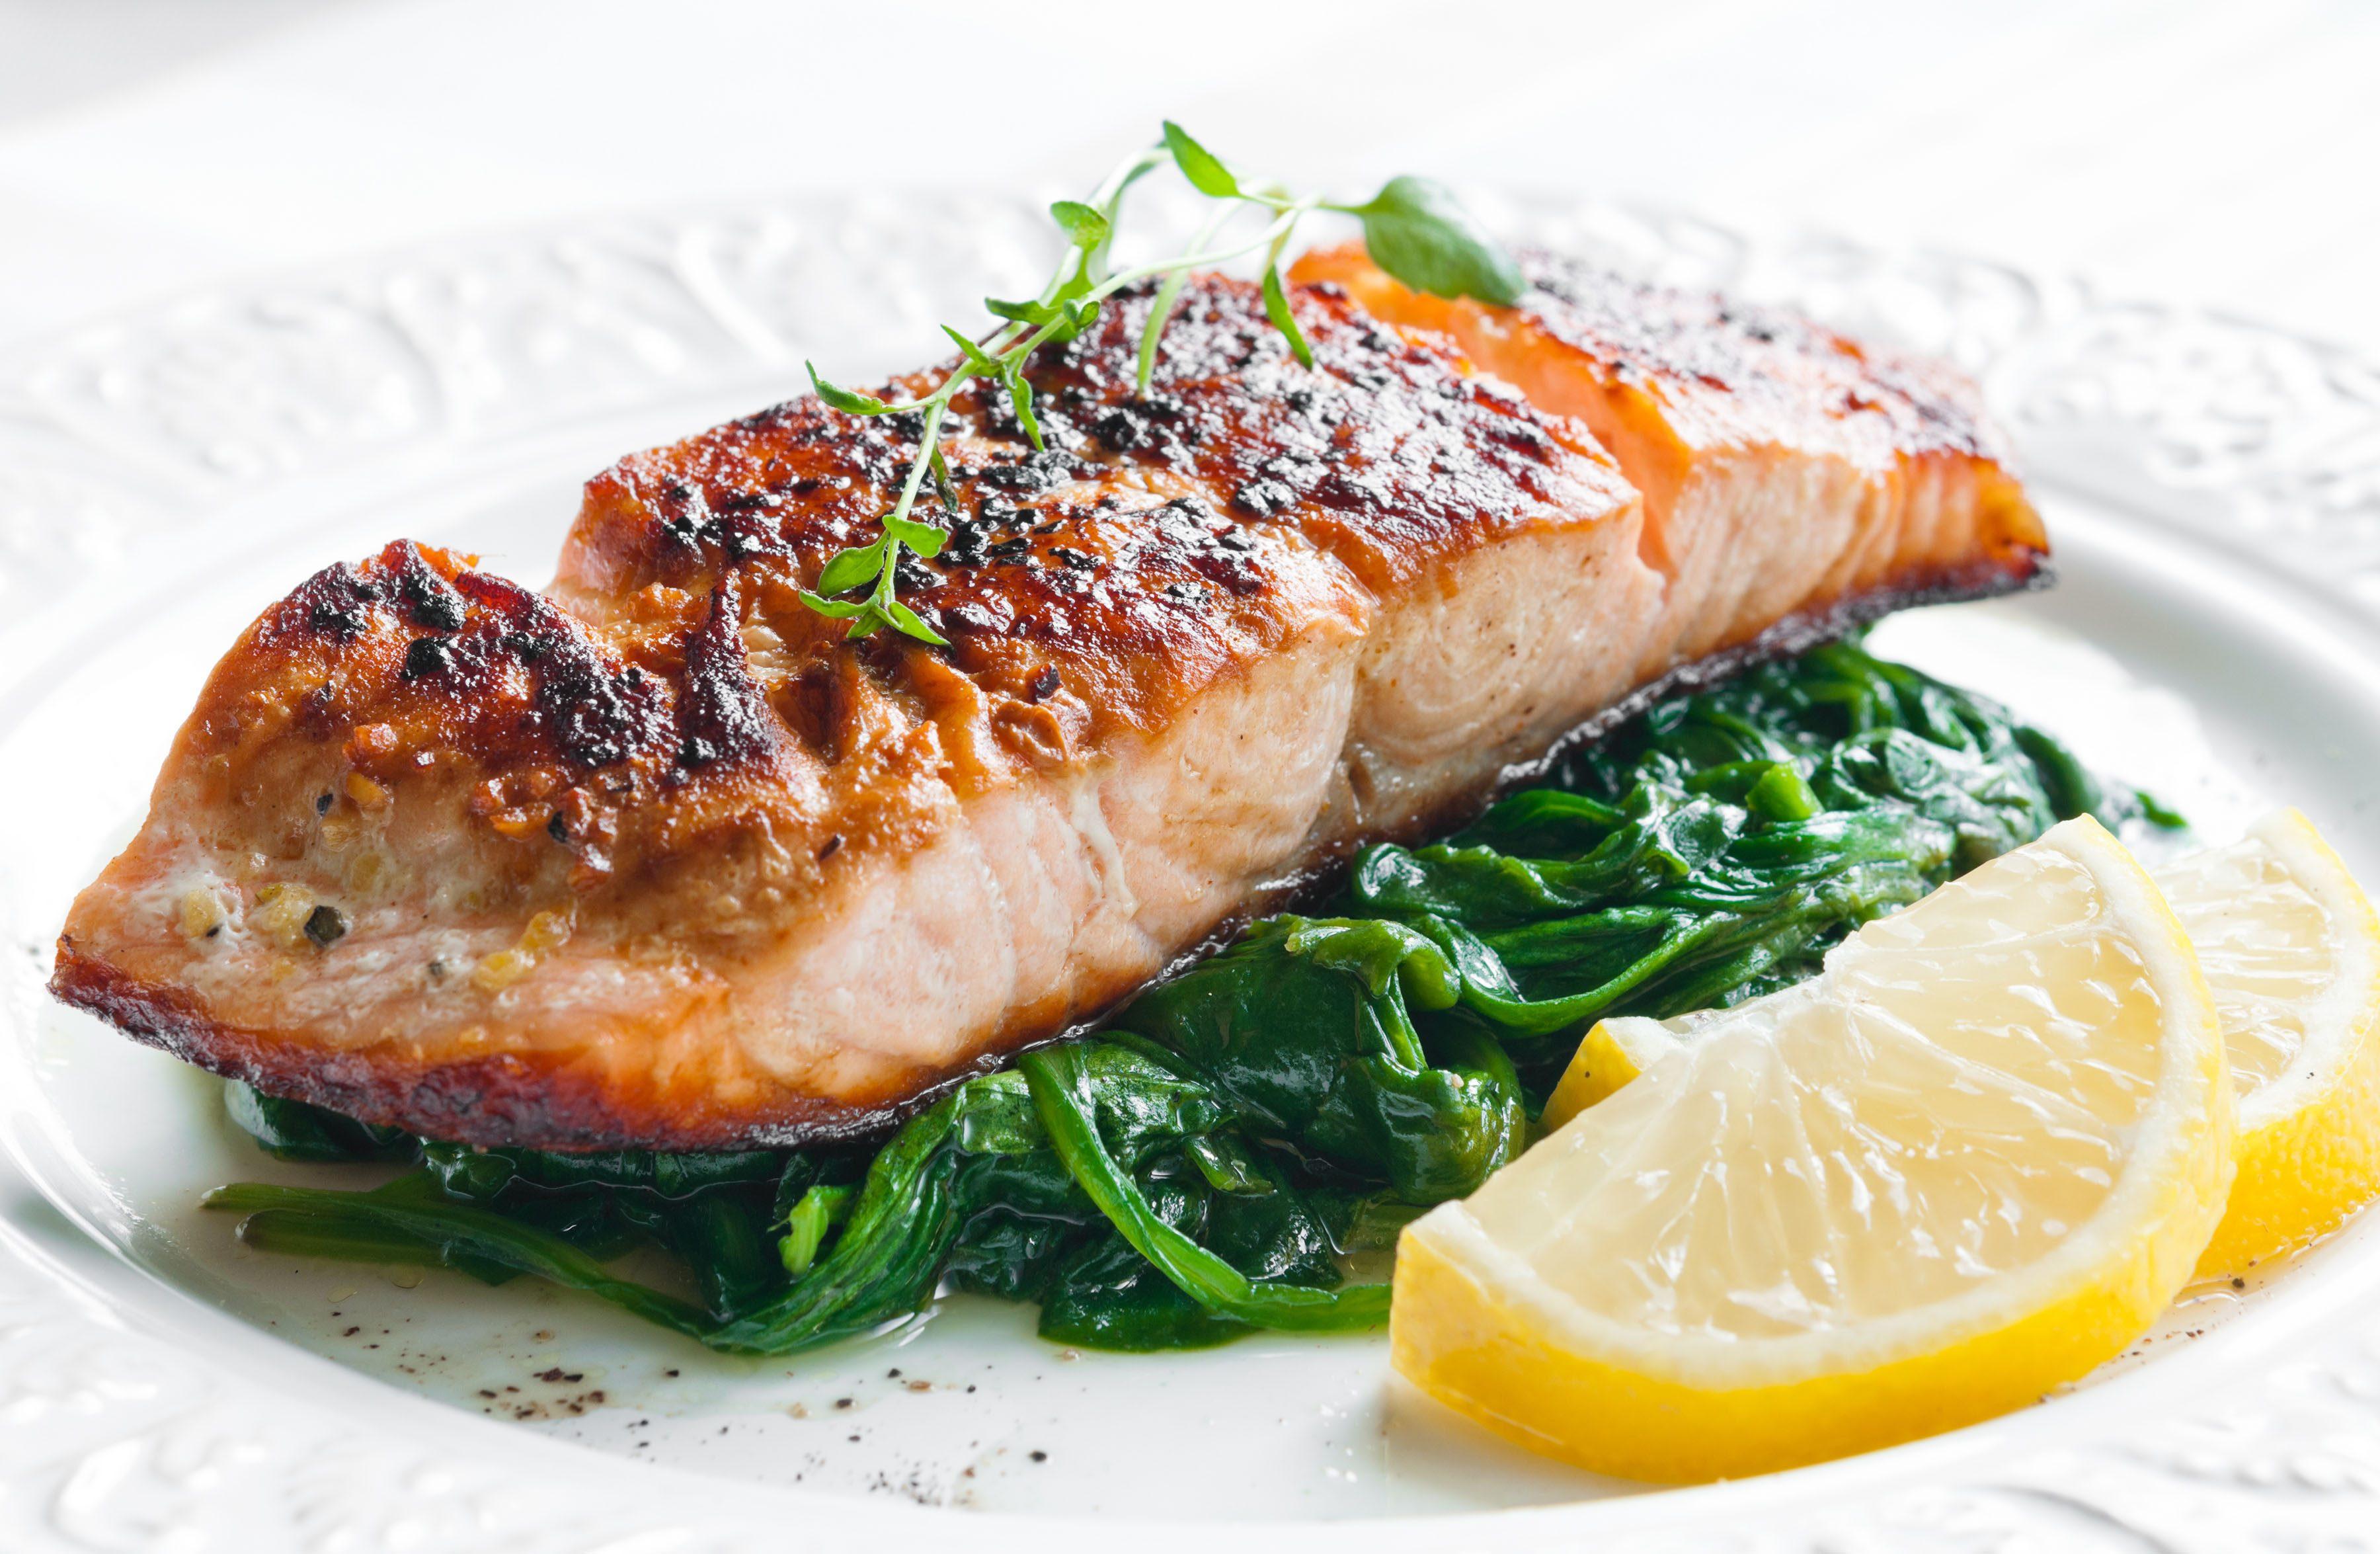 Roasted Salmon with Sauteed Greens